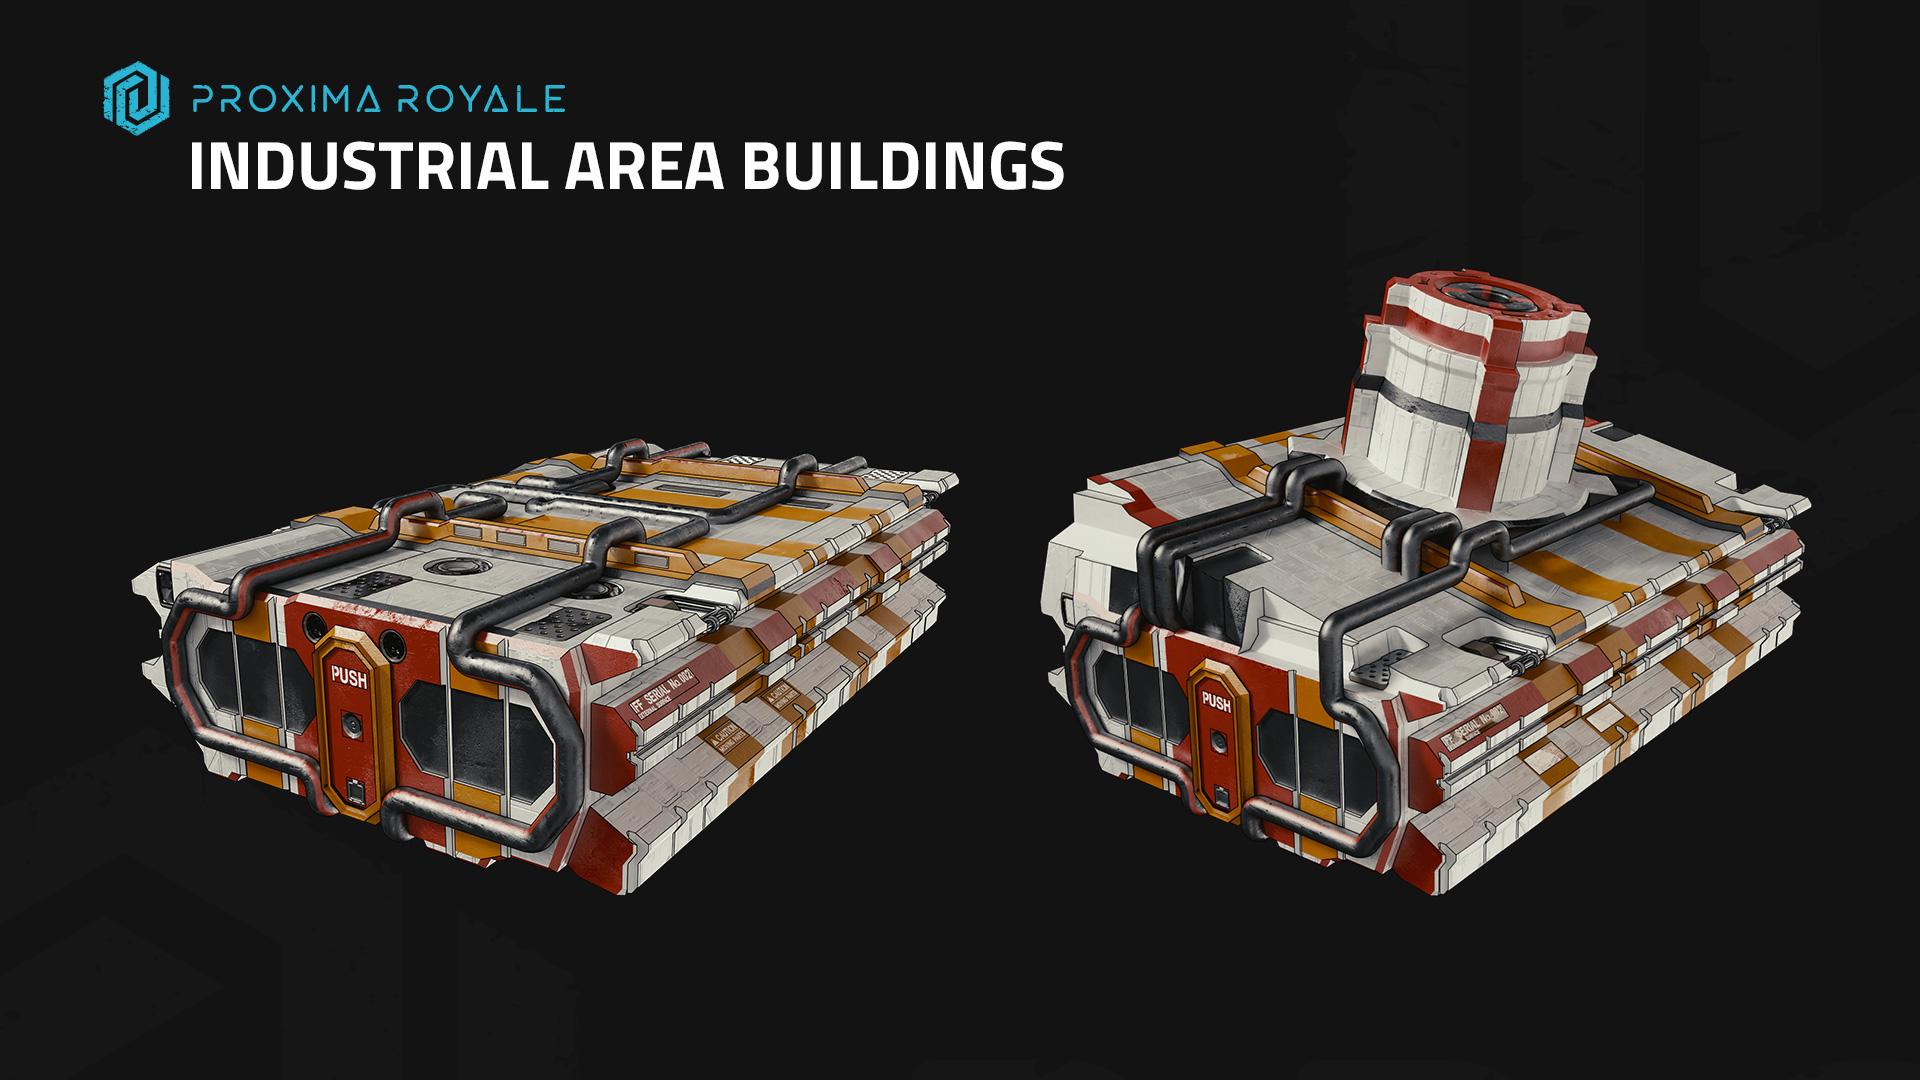 2 industrial area buildings 1